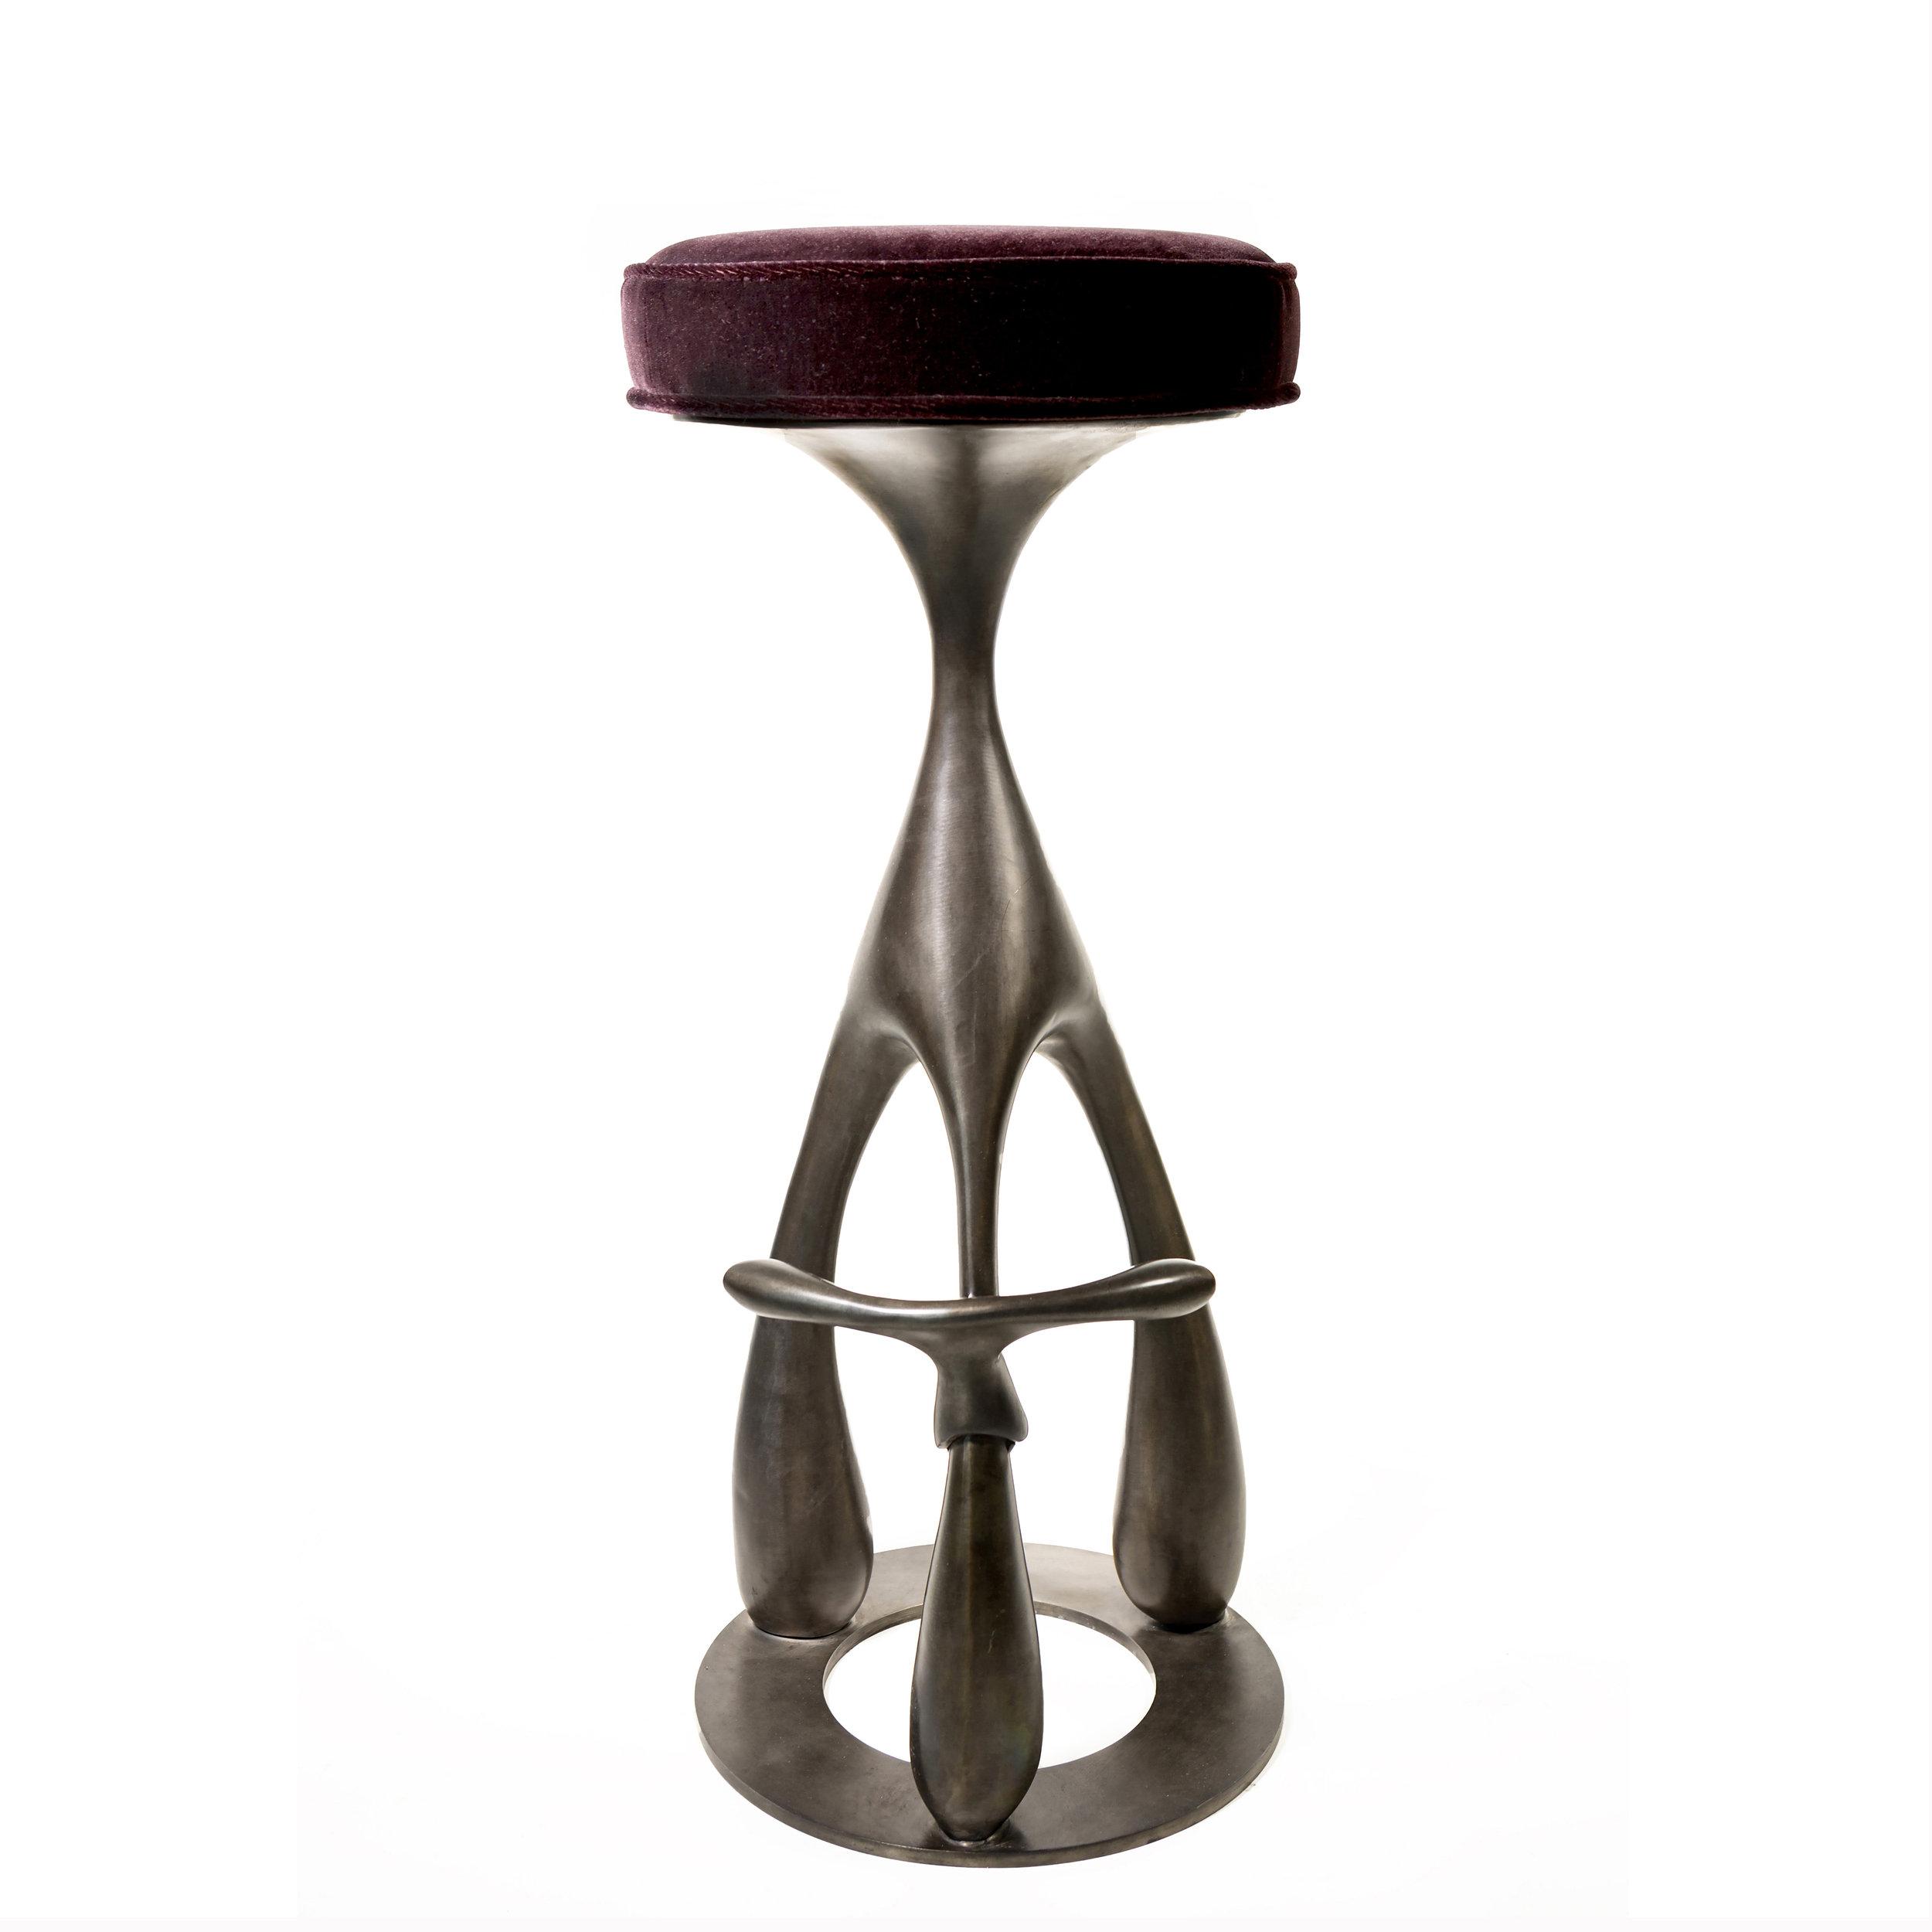 east stool JMA_Bronzebarstoolsingle_CLEAN_63A8063.jpg